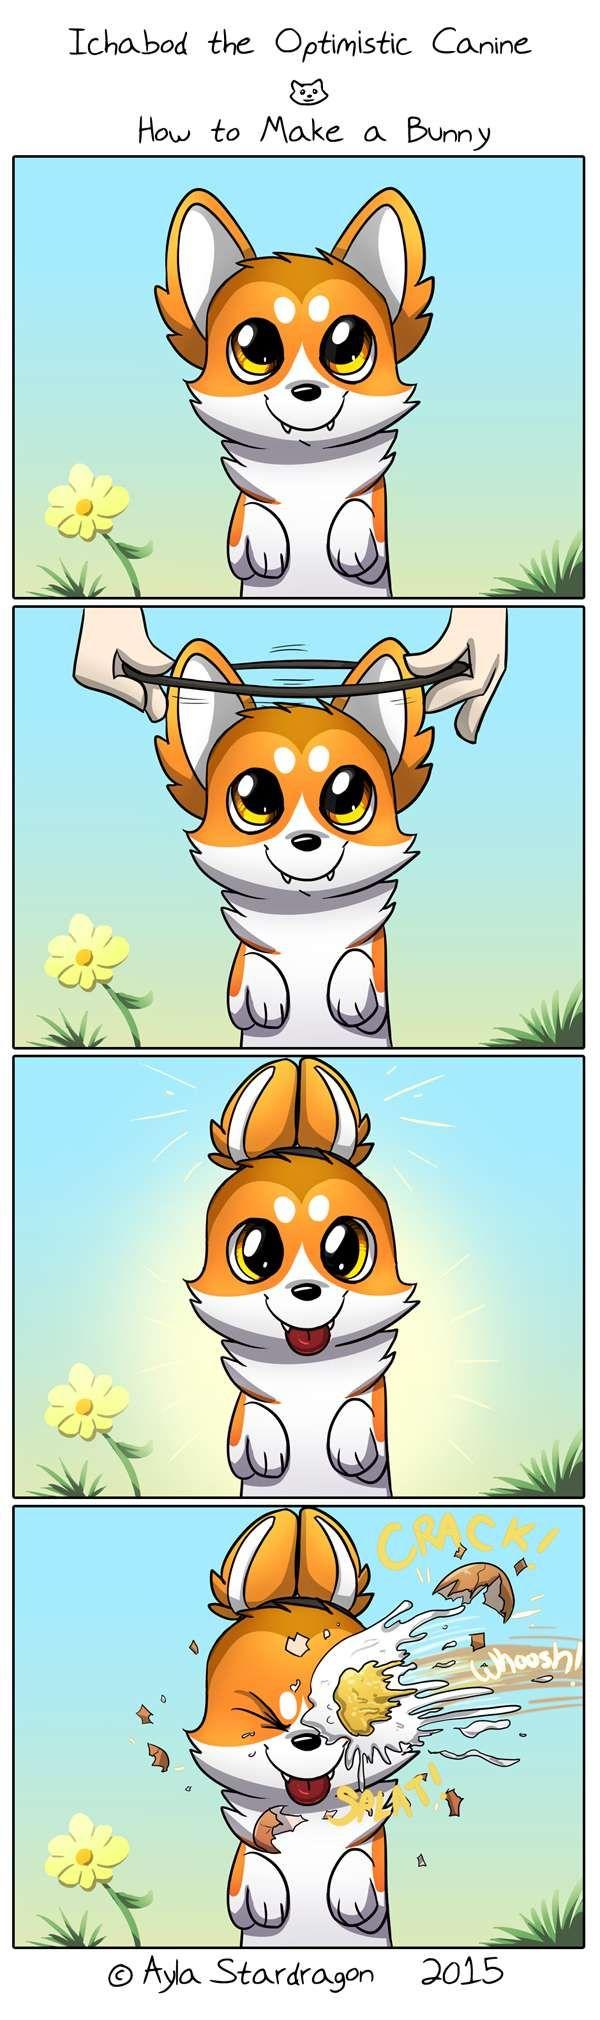 Ichabod the Optimistic Canine :: How to Make a Bunny | Tapastic Comics - image 1